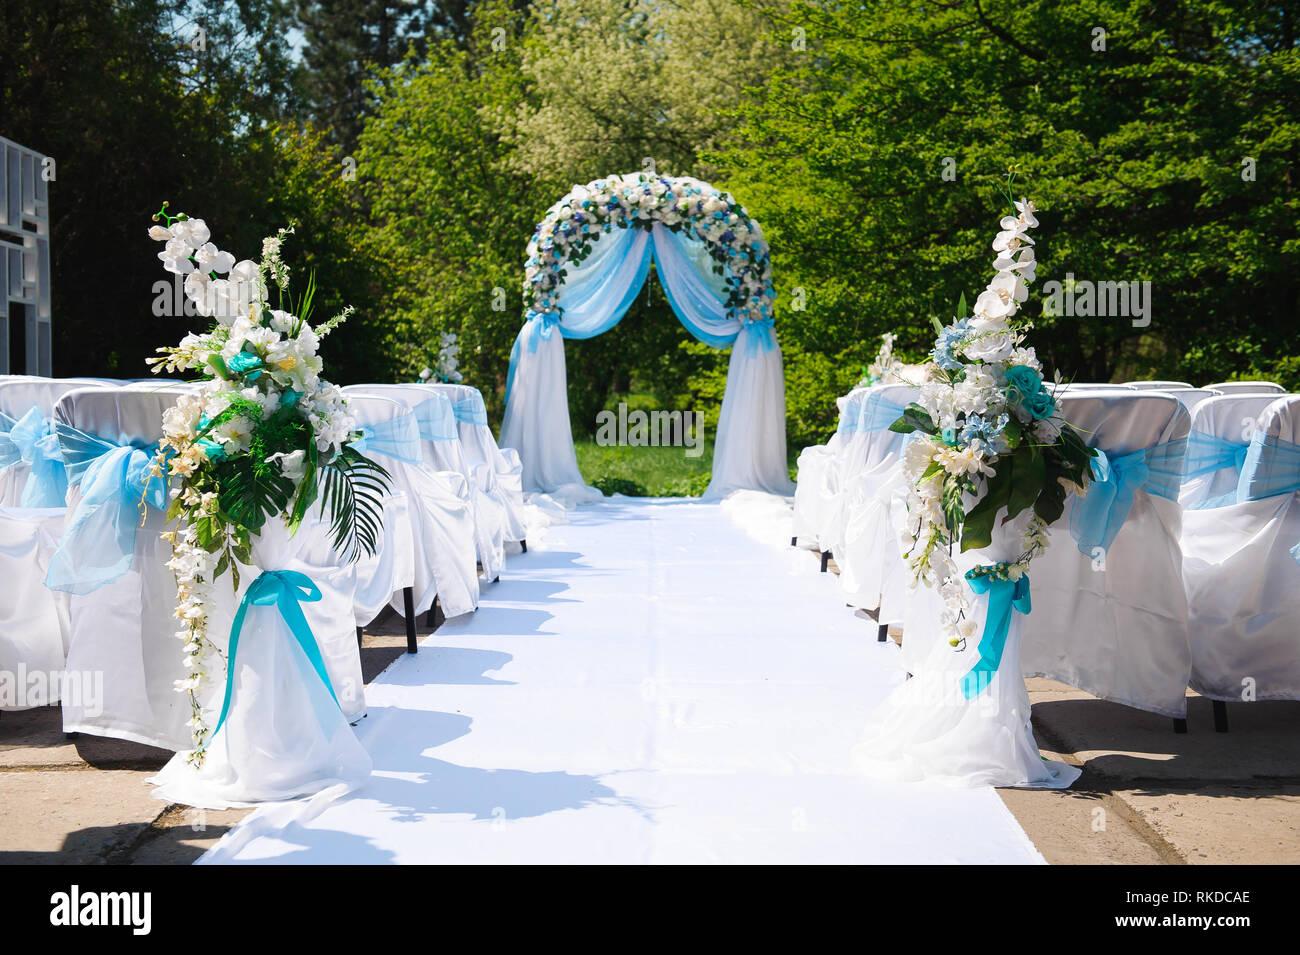 Wedding Decorations At Ceremony, Beautiful Decor, Wedding